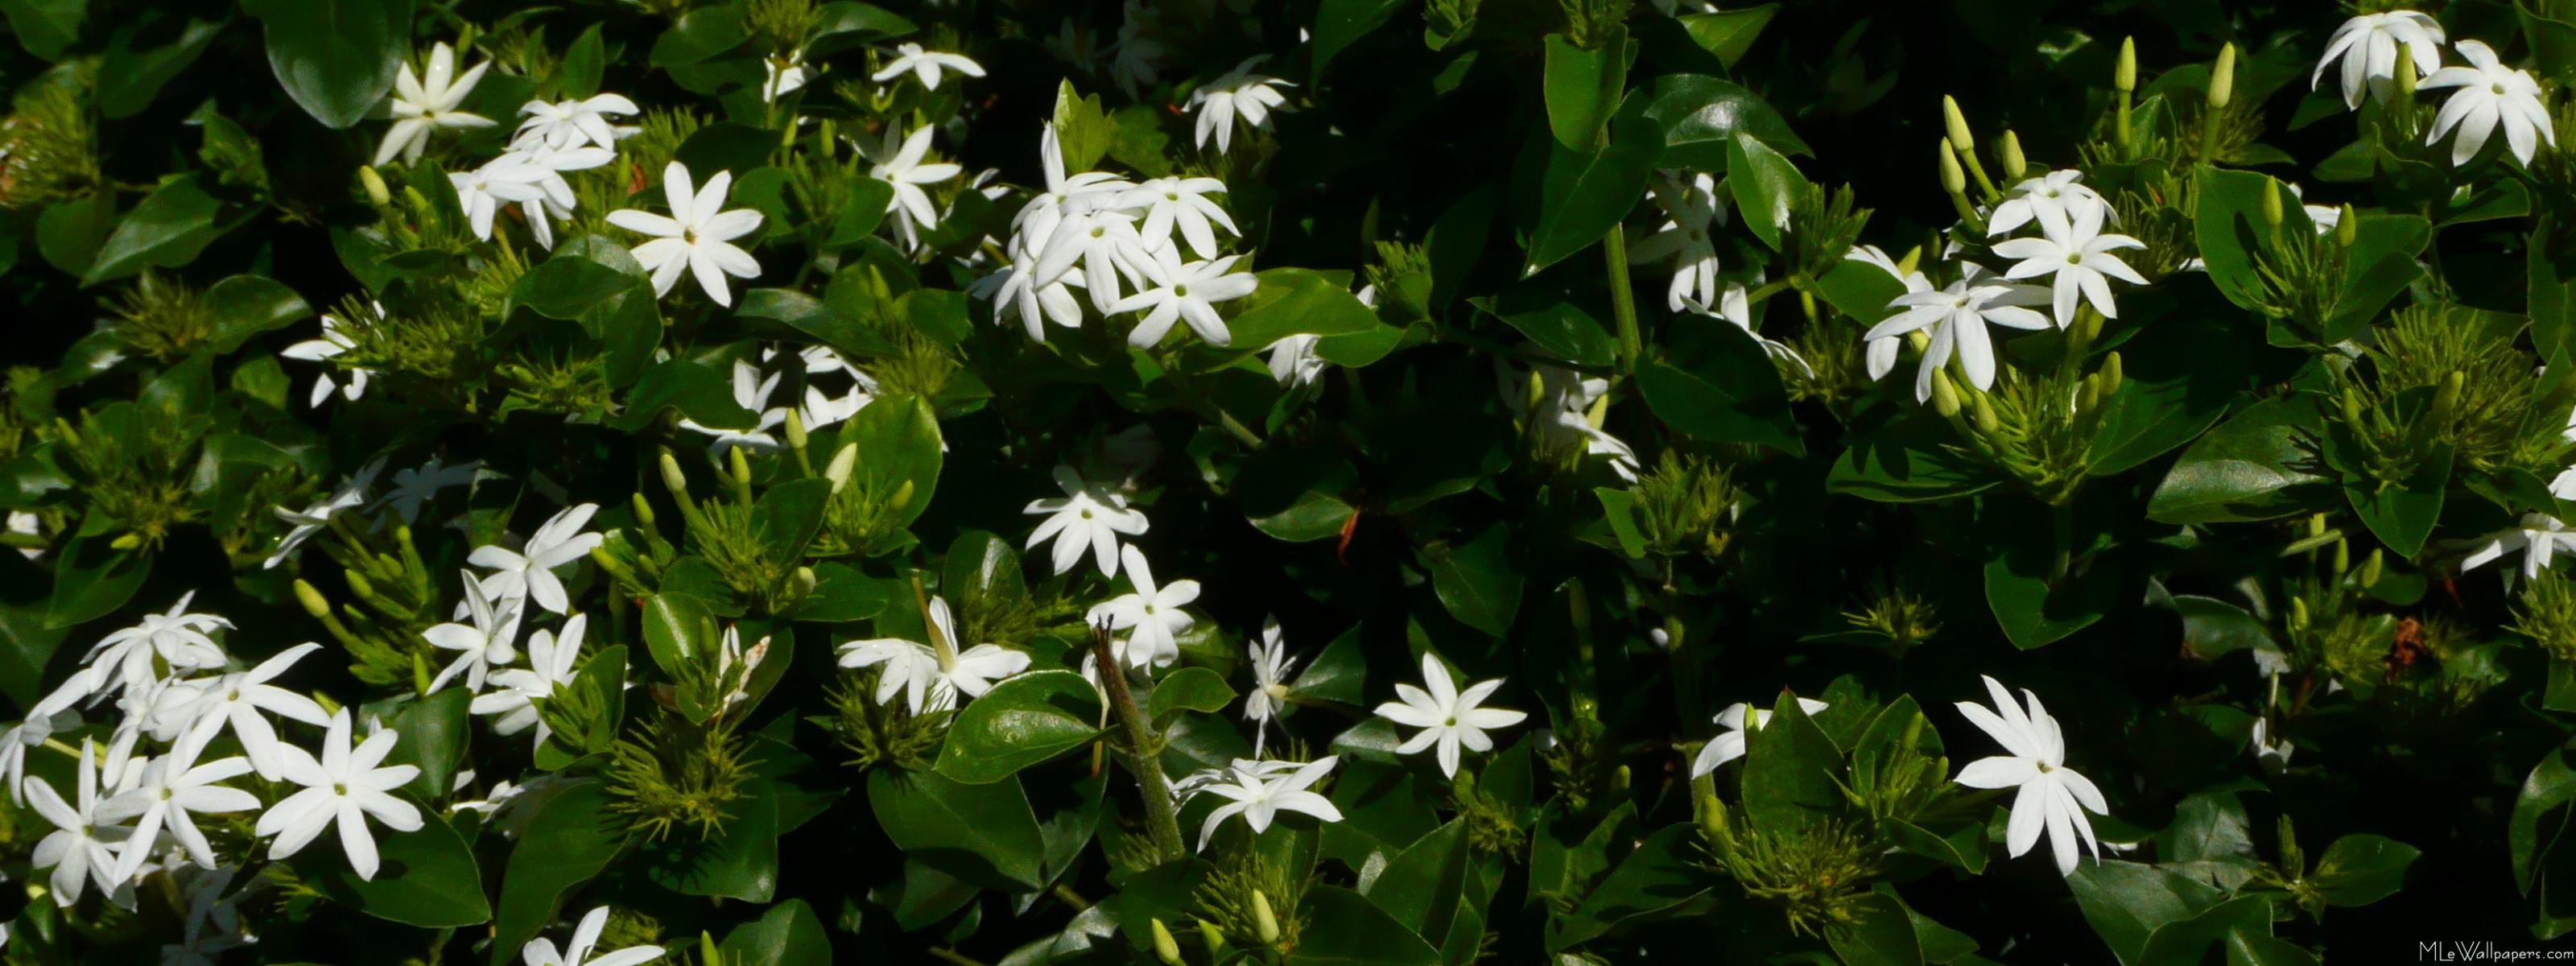 Mlewallpapers jasmine flowers jasmine flowers 598g izmirmasajfo Gallery